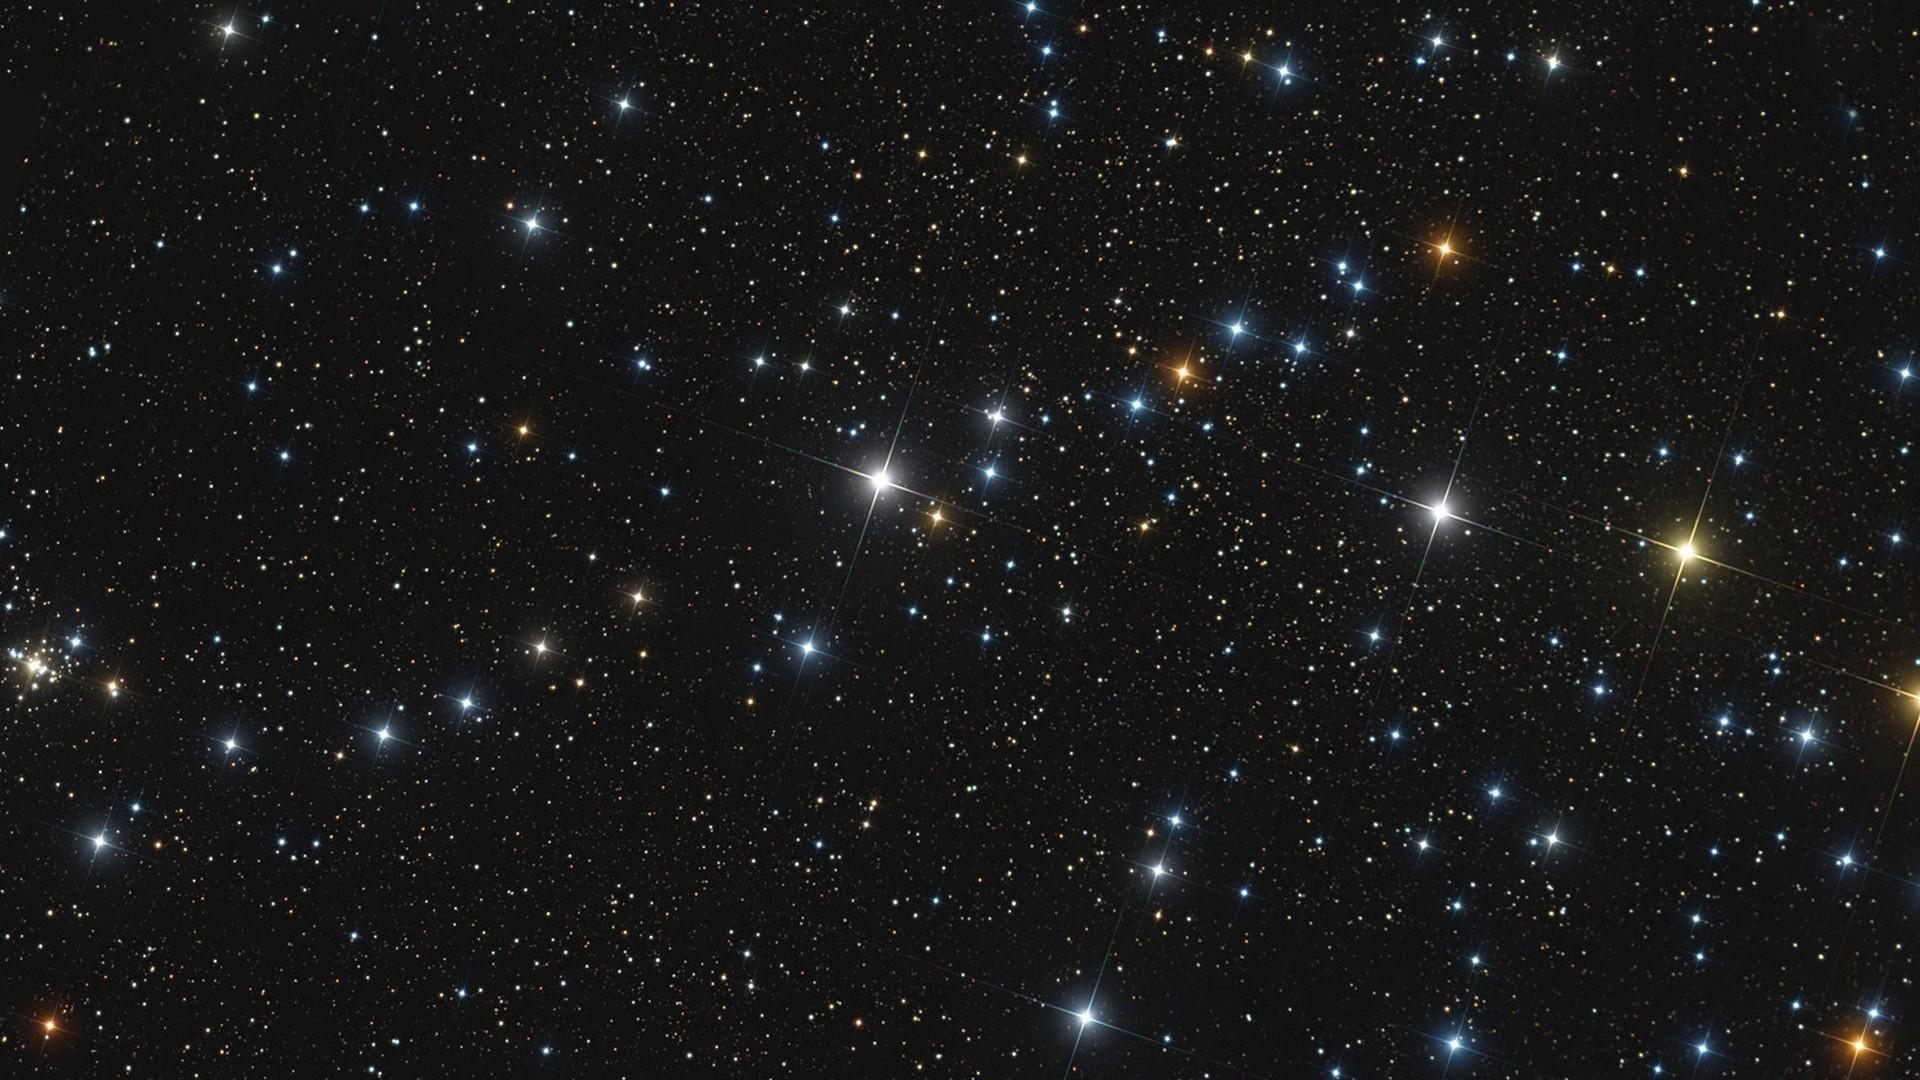 Space Stars Hd 12 Desktop Background   Hivewallpapercom 1920x1080